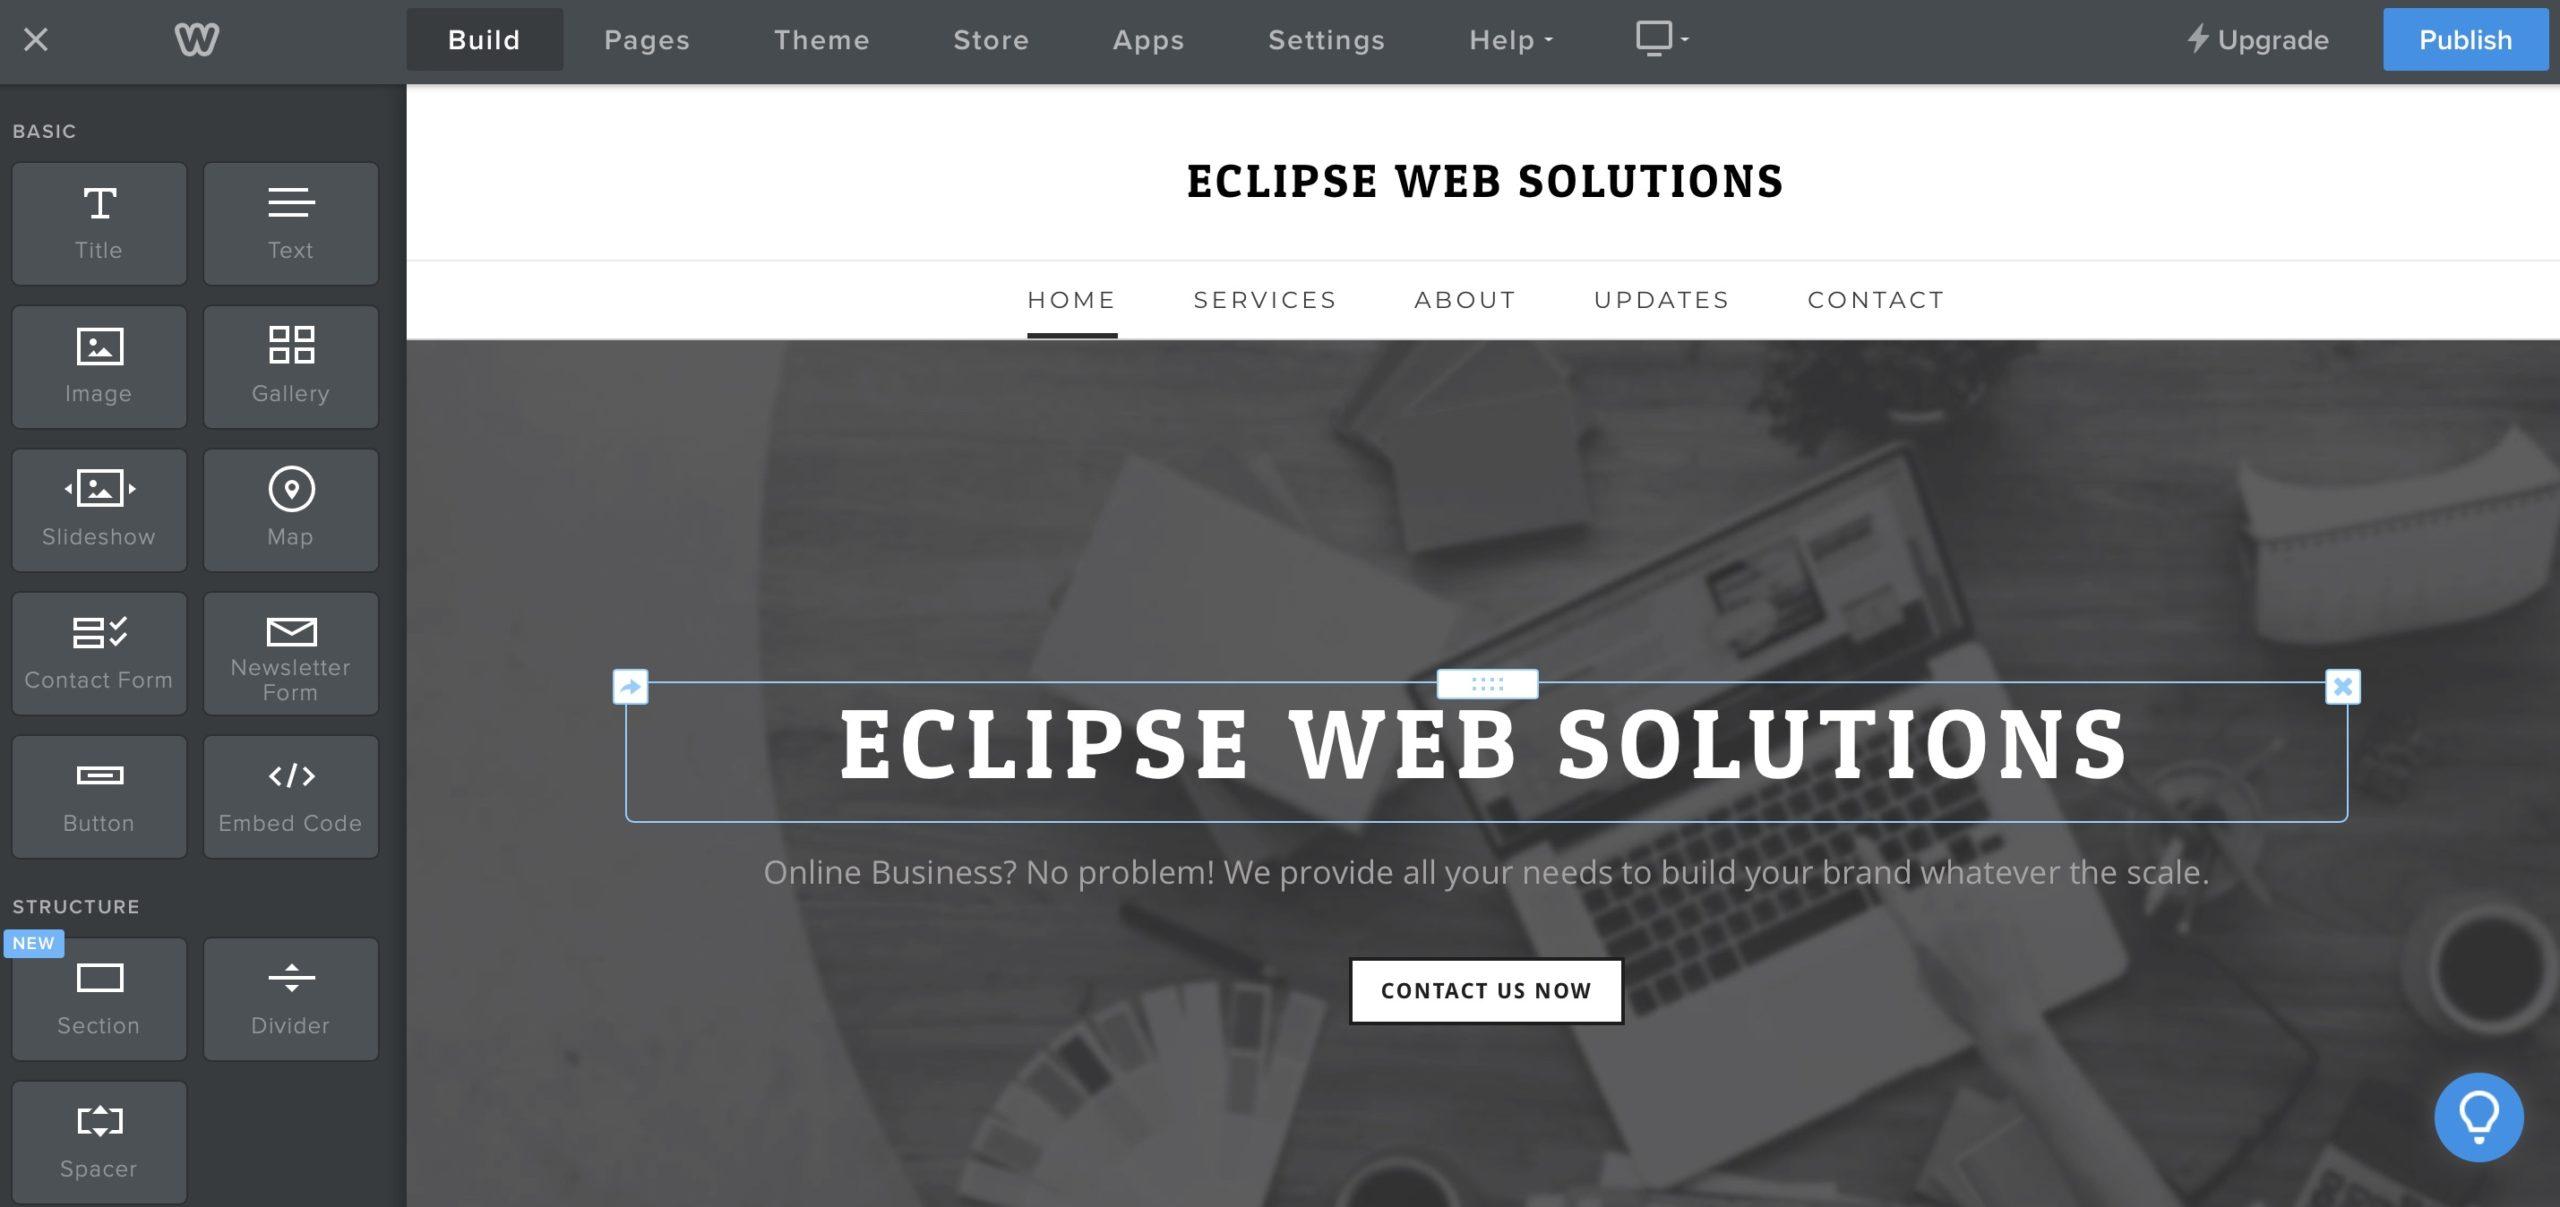 Weebly website editor screenshot